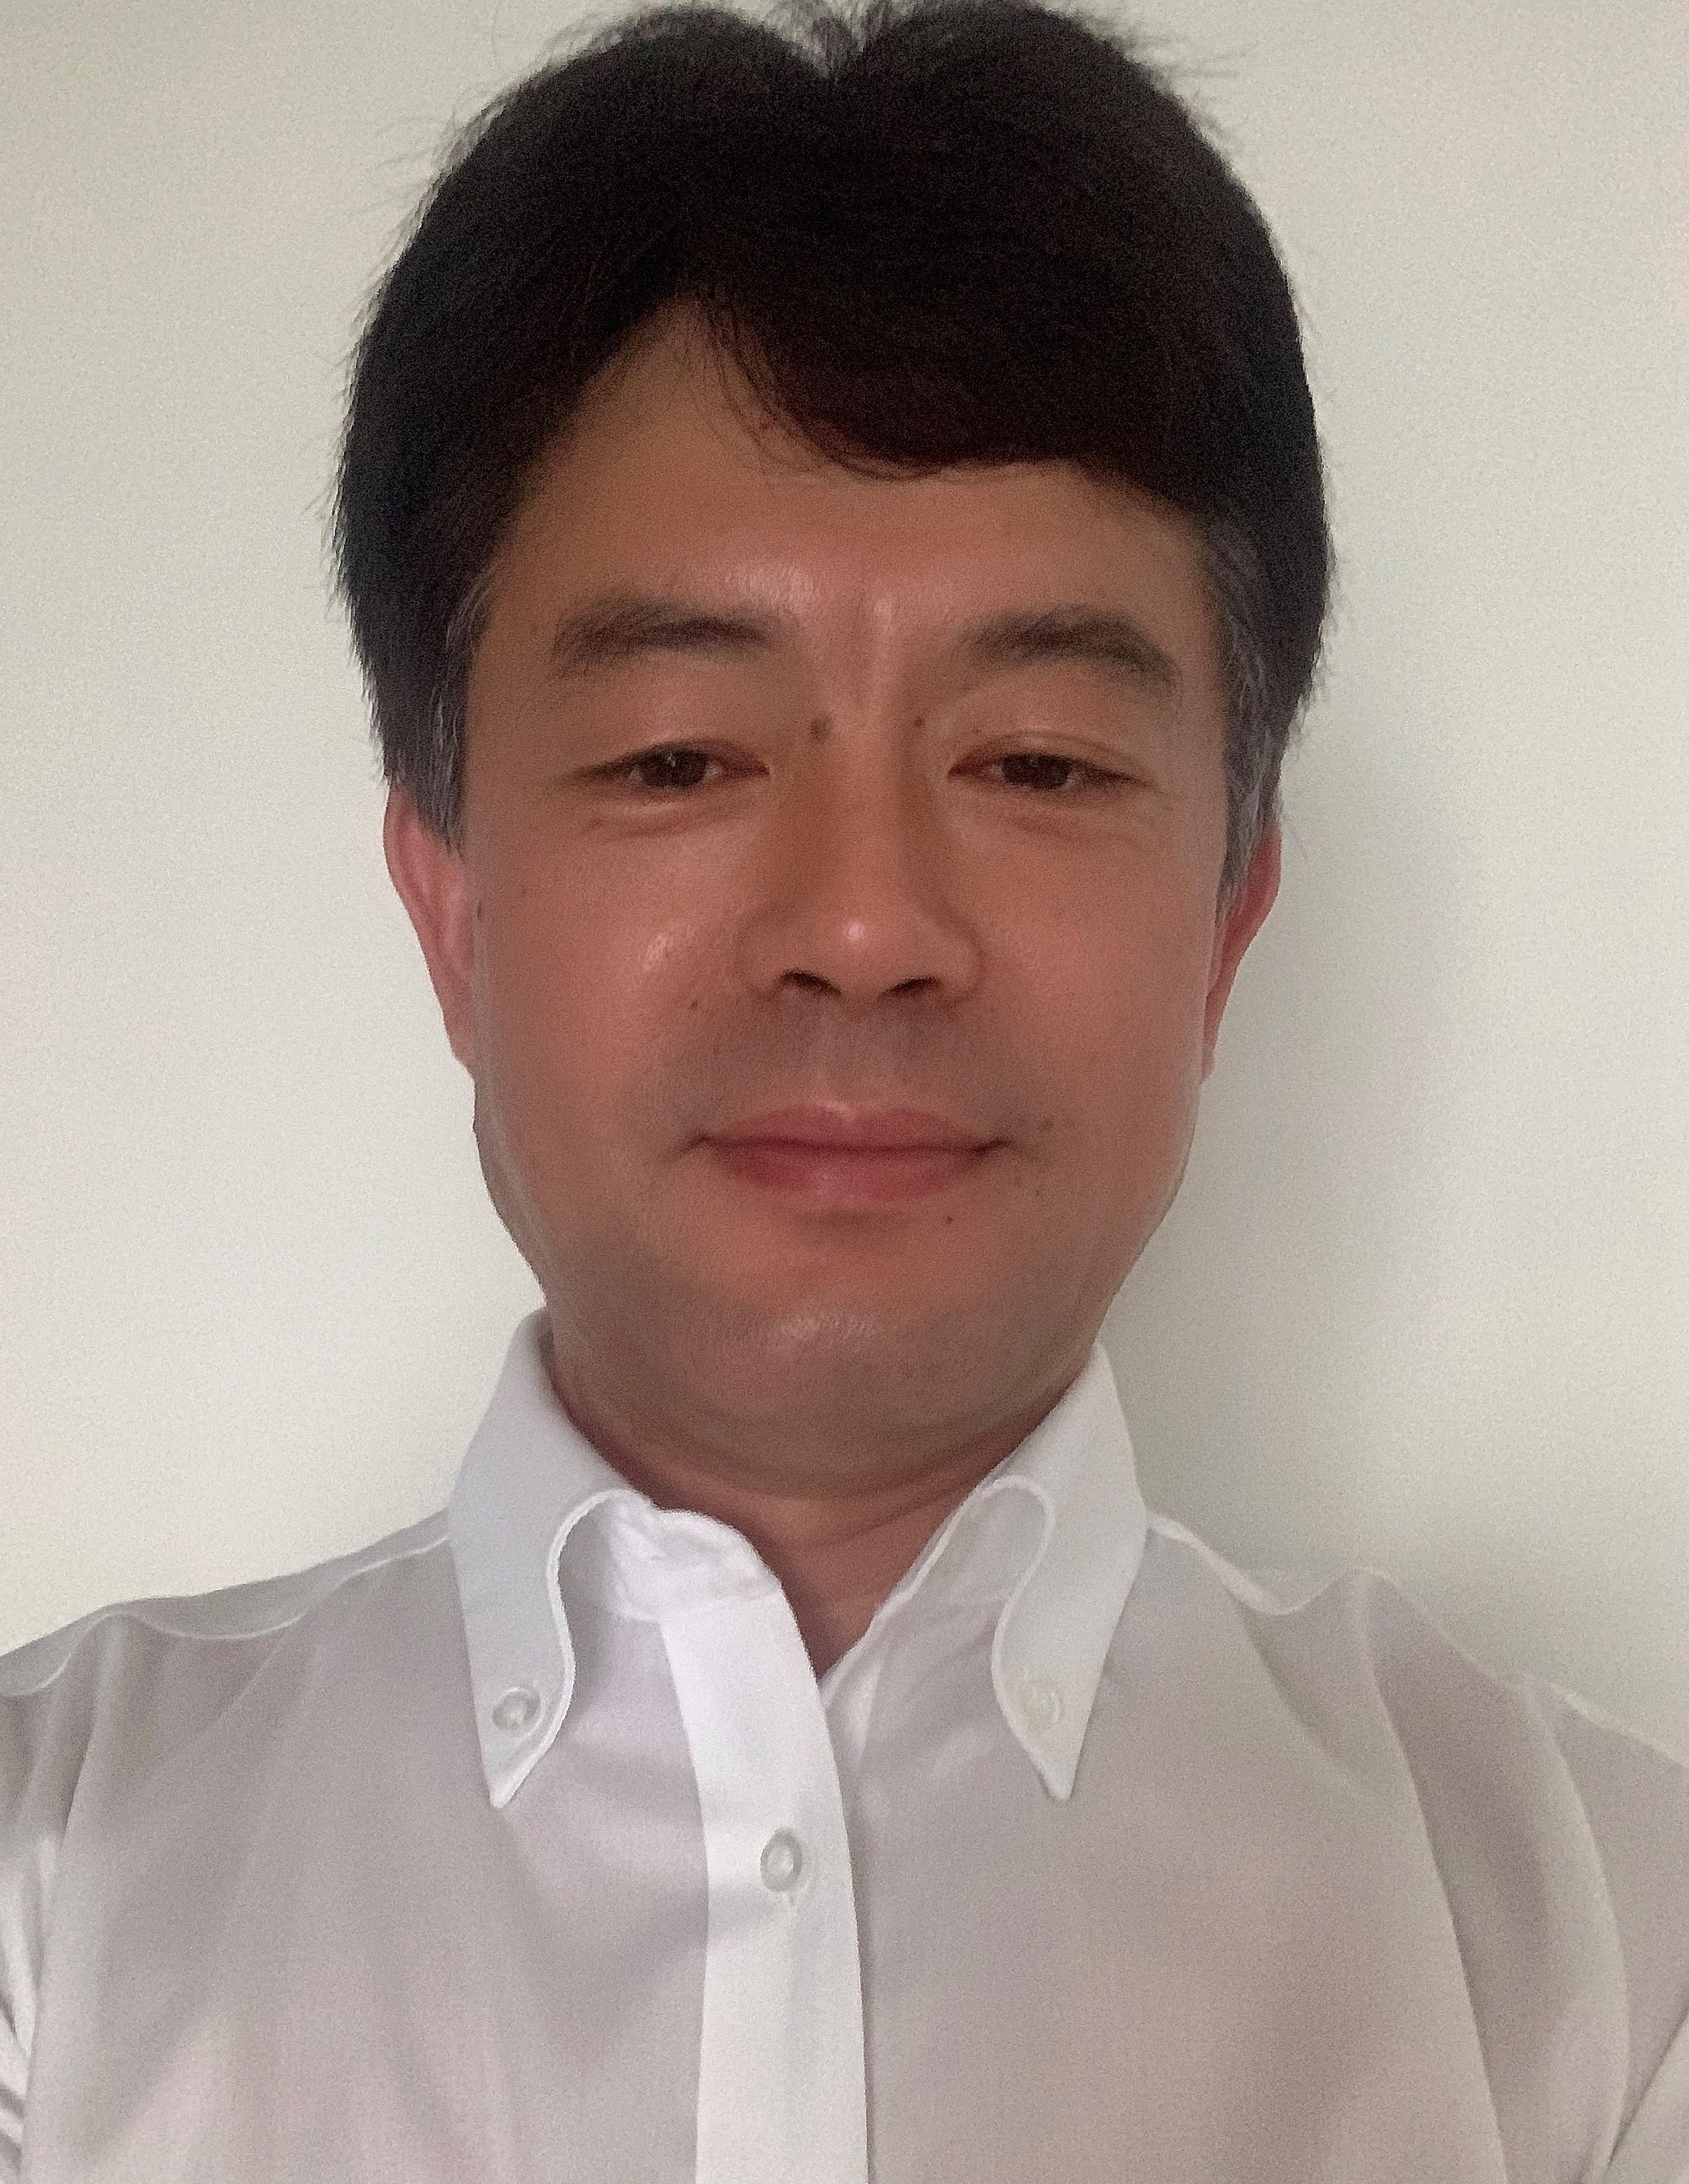 Daniel Zhang - 张国平 / 中国服务经理电子邮件:daniel.zhang@atlasconverting.com